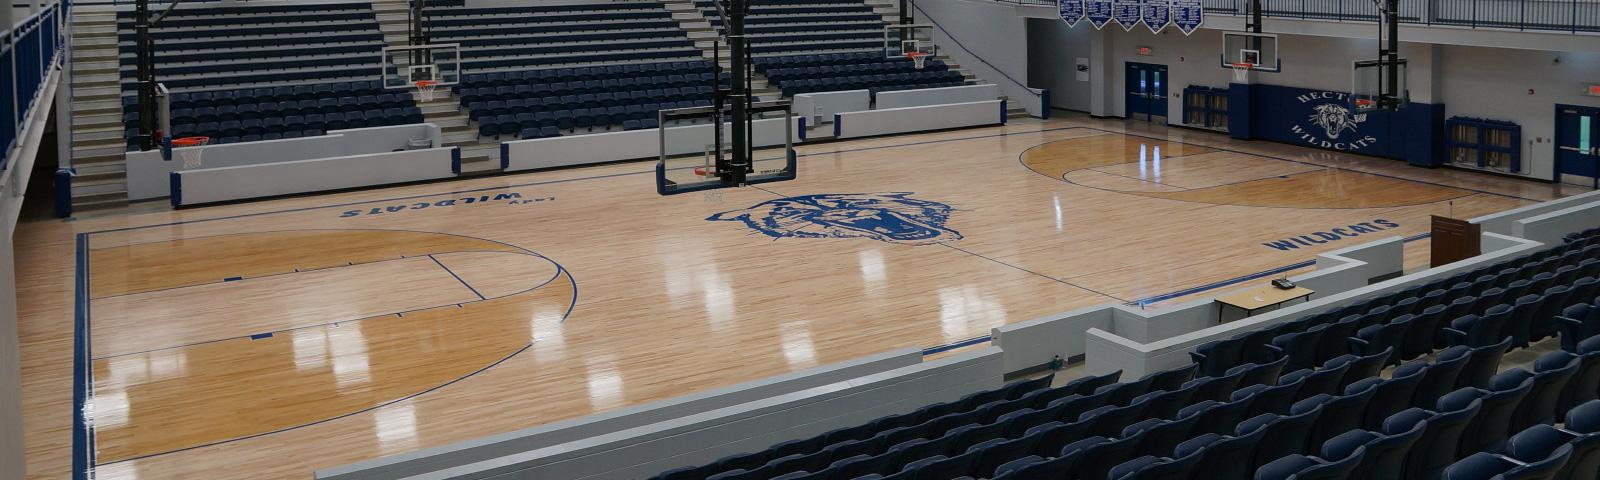 Richey Hardwood Floors - Gymnasium Floor Installation